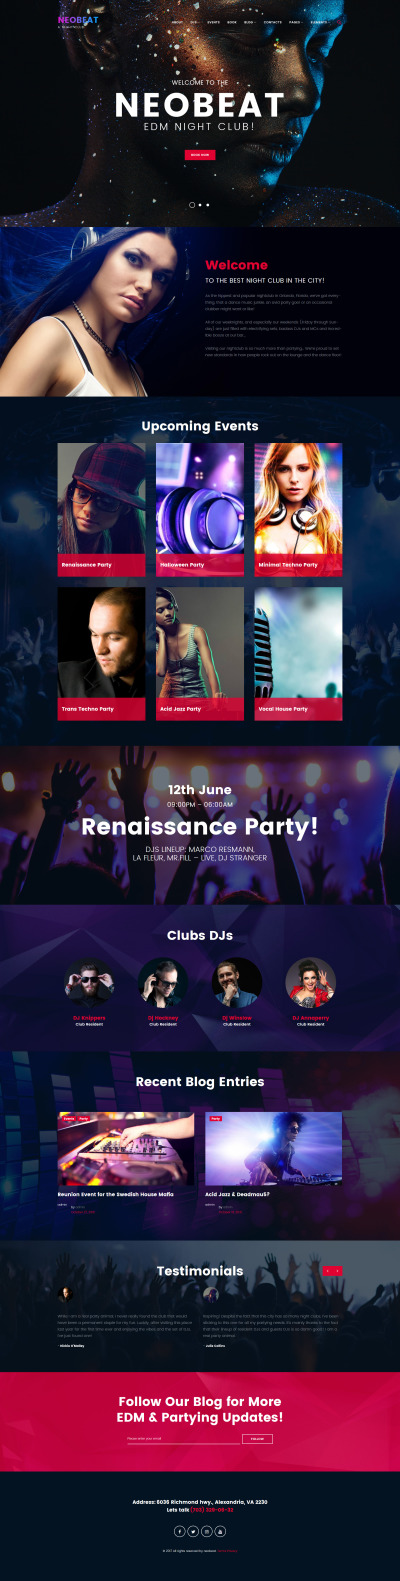 Neobeat - Night Club & Entertainment